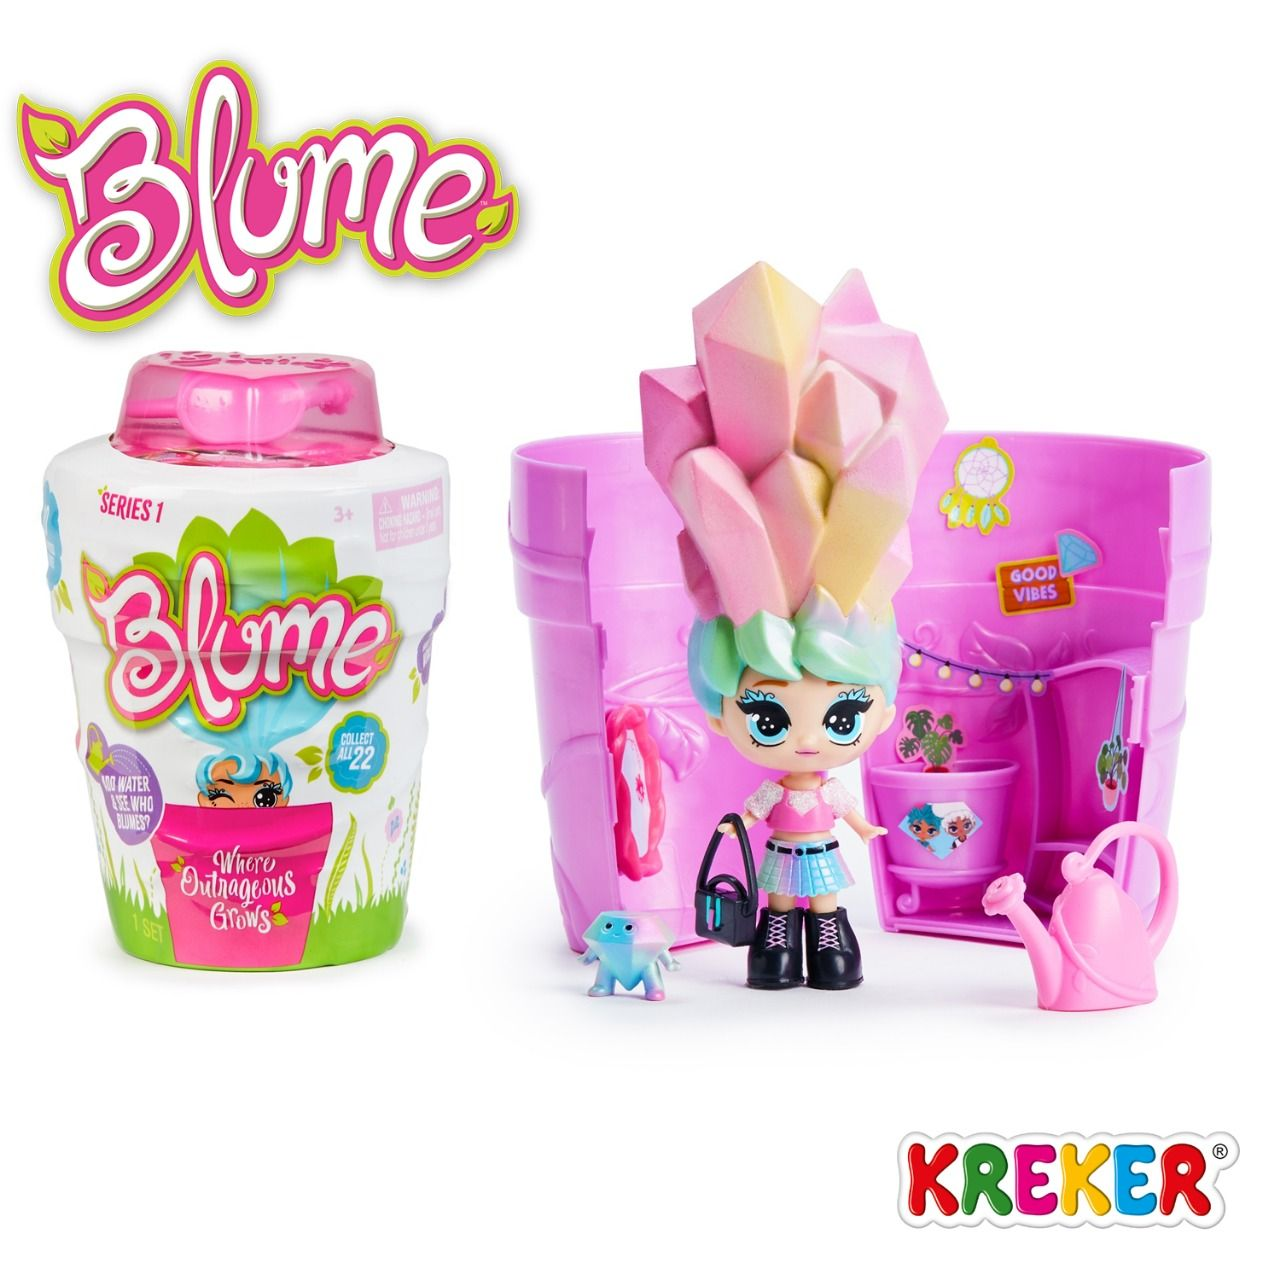 Blume Doll Kreker Juguetes Para Niñas Juguetes De Navidad Juguetes Geniales